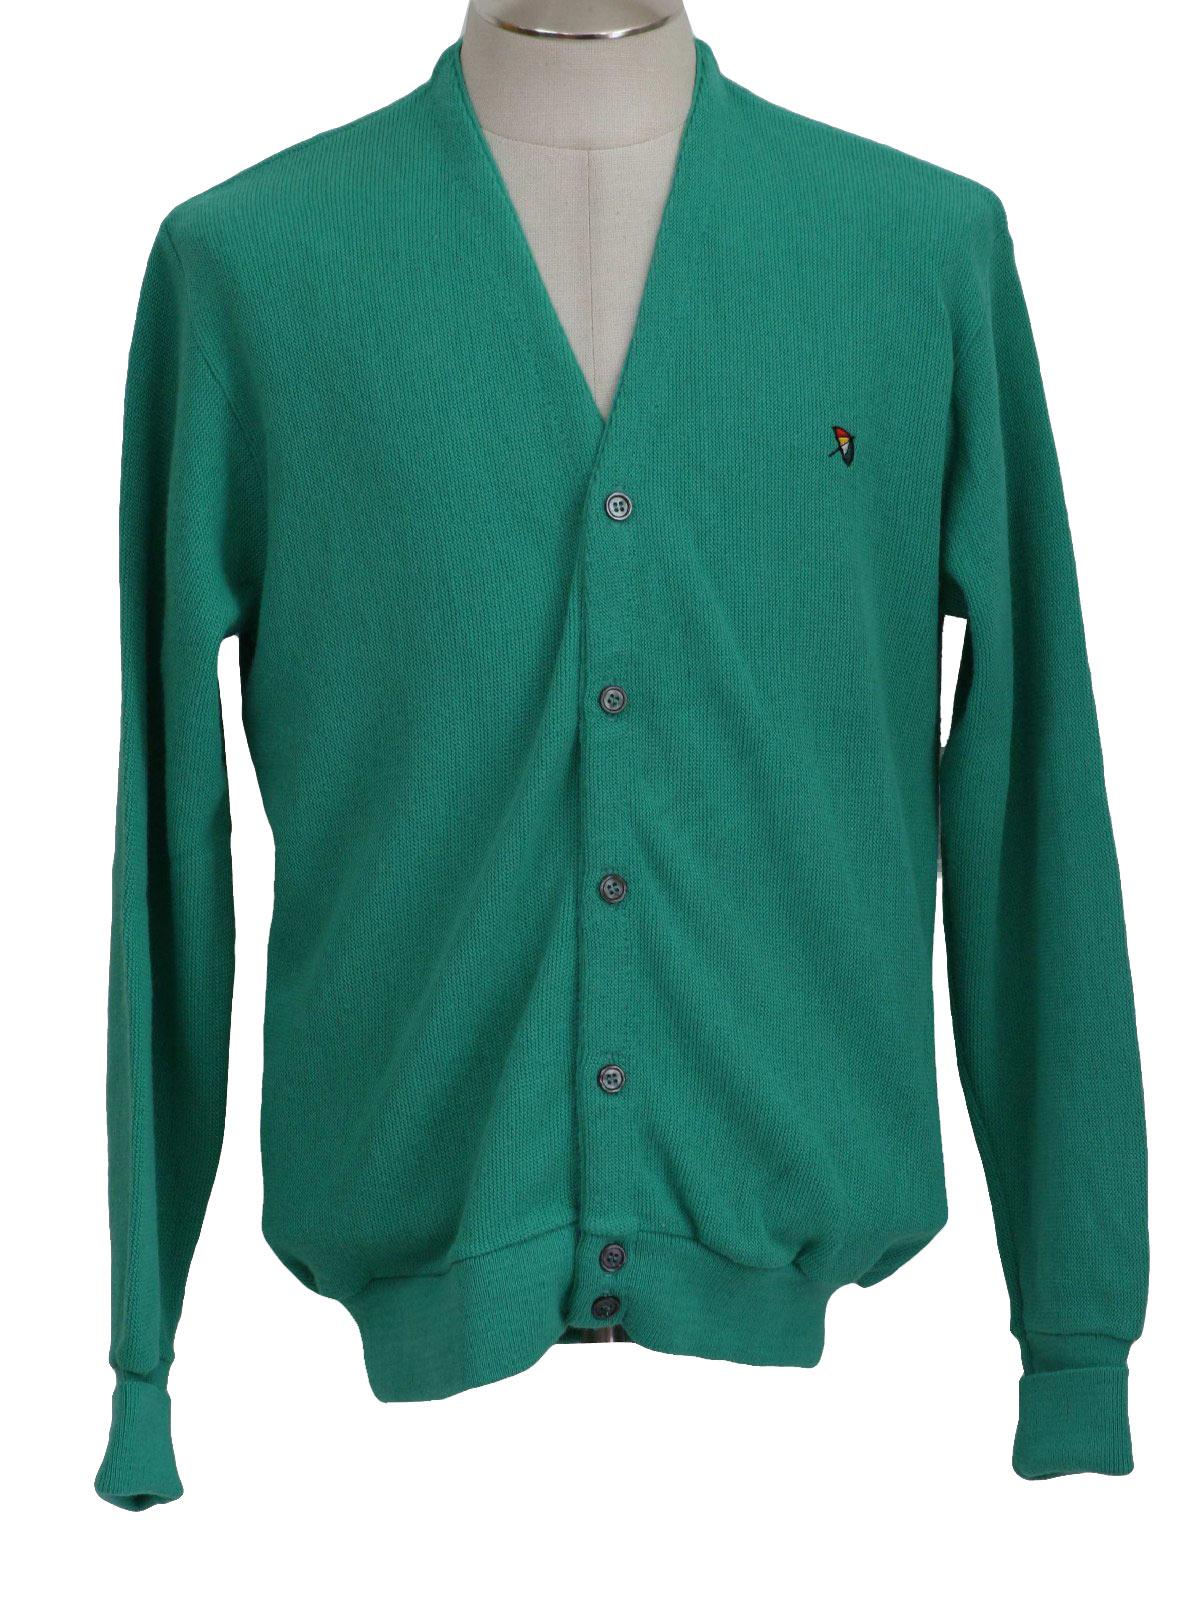 Eighties Vintage Caridgan Sweater 80s Arnold Palmer